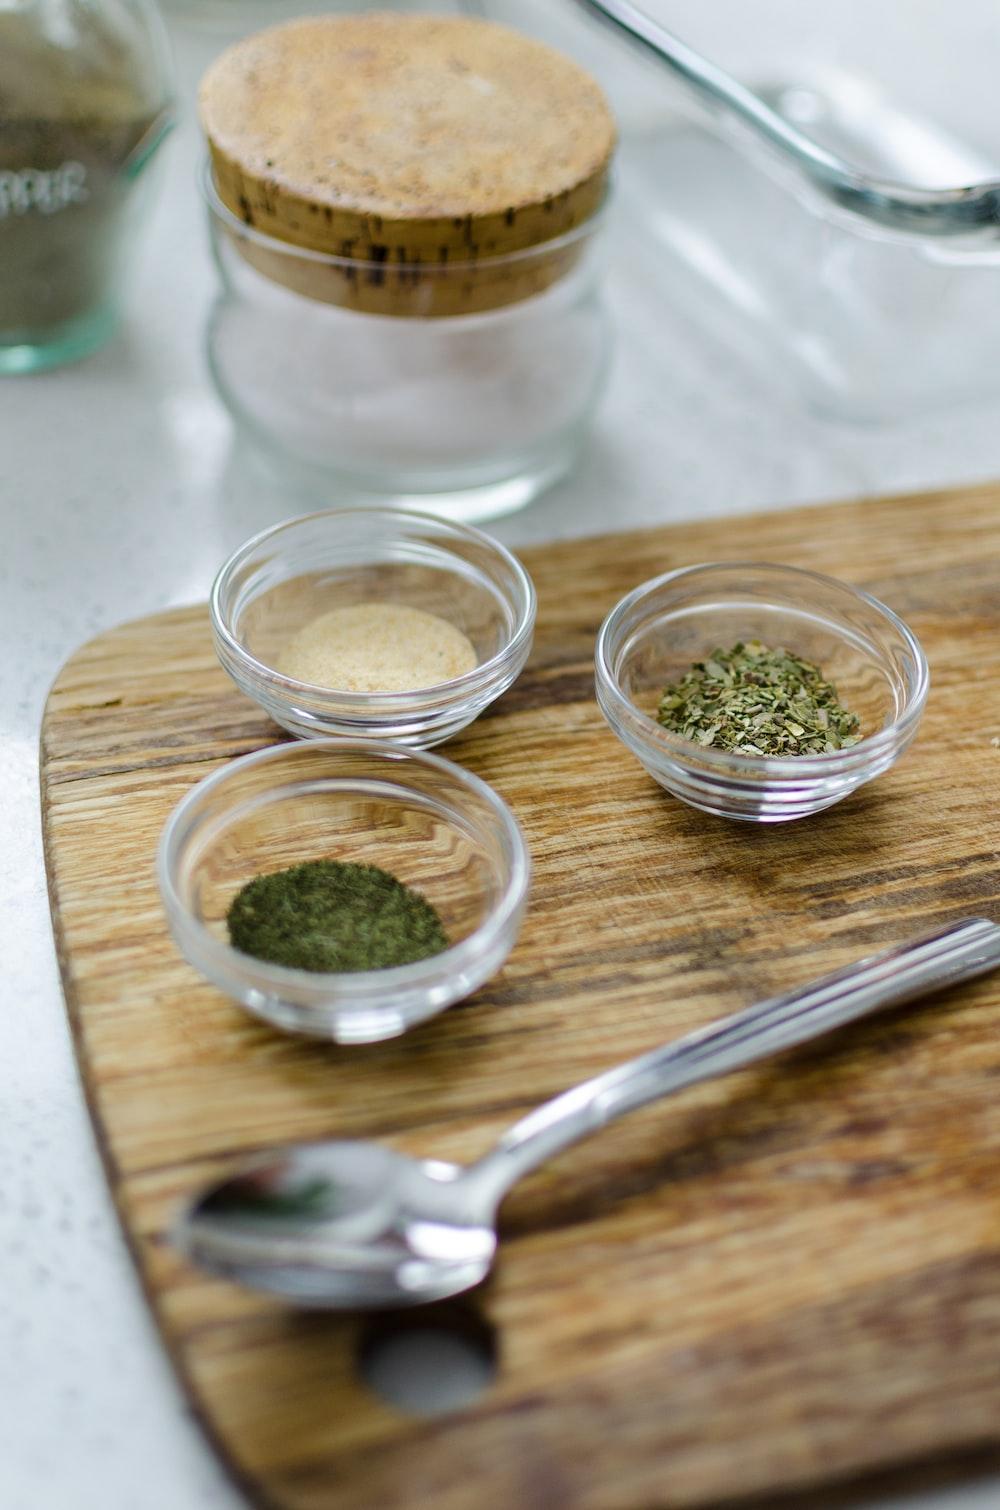 green powder in clear glass bowl